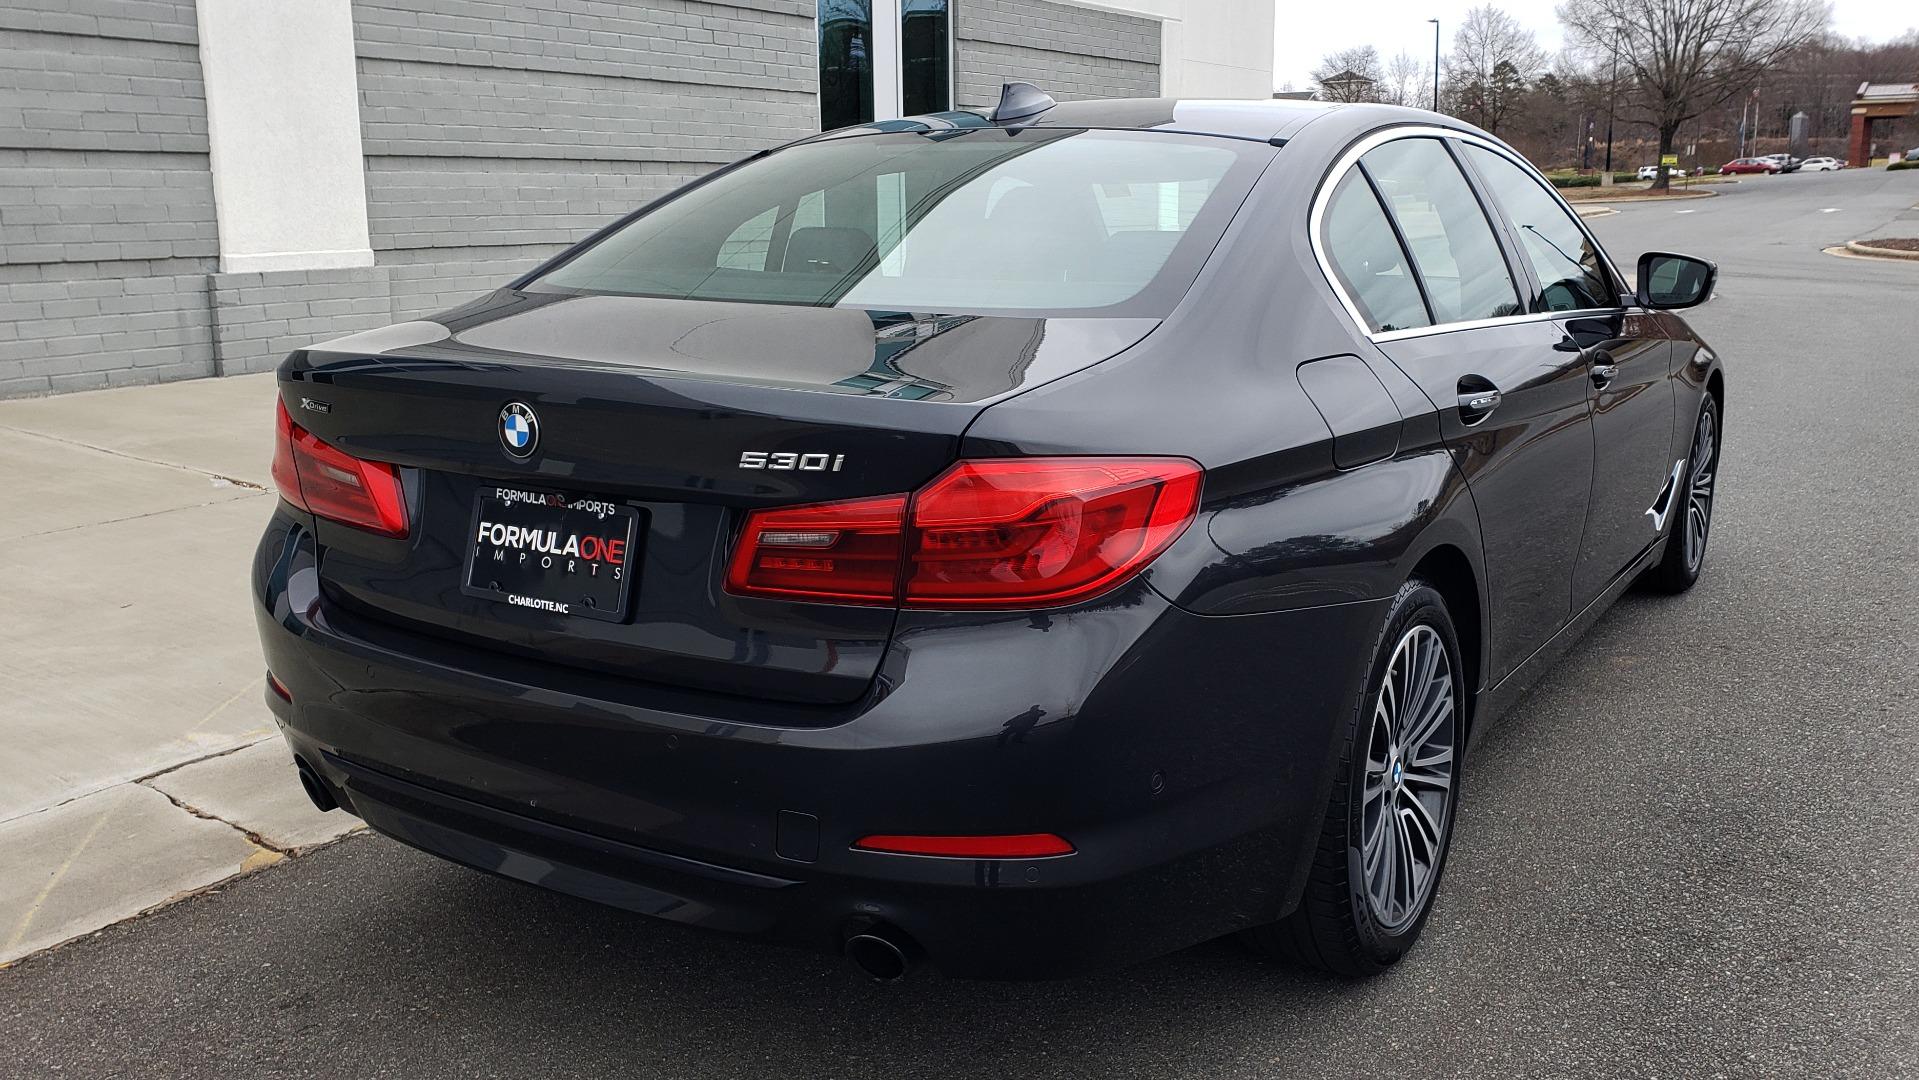 Used 2017 BMW 5 SERIES 530IXDRIVE / PREM PKG / DRVR ASST PLUS / CLD WTHR / APPLE CARPLAY for sale Sold at Formula Imports in Charlotte NC 28227 6